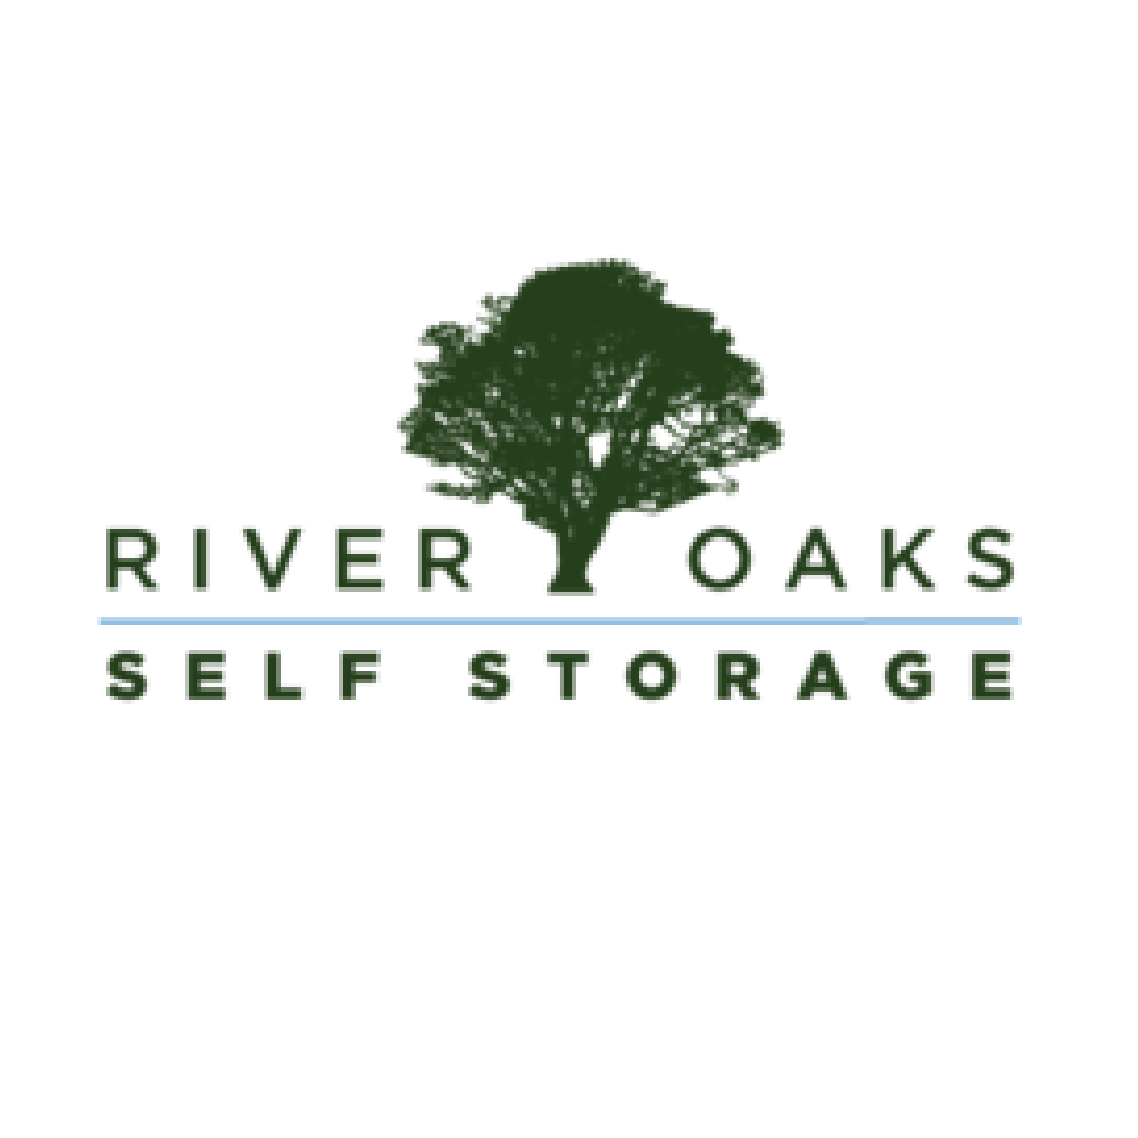 River Oaks Storage image 0